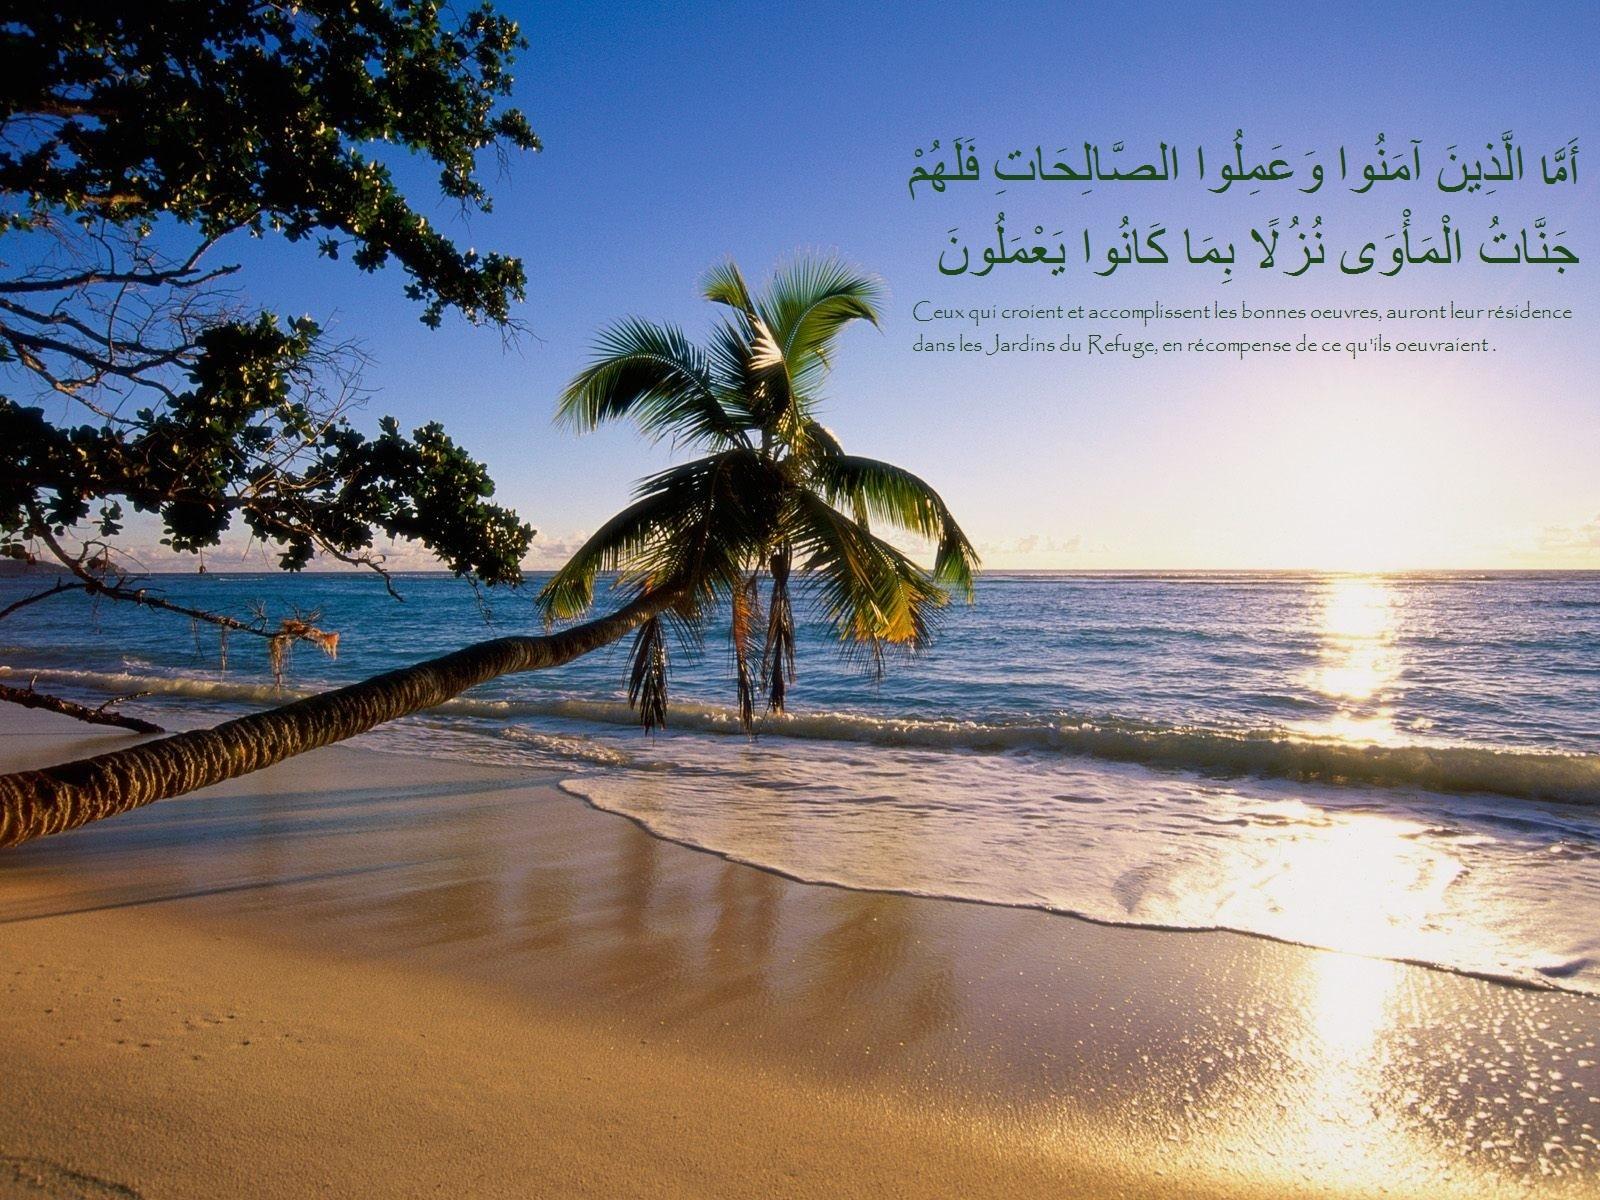 Fond ecran islam for Ecran image